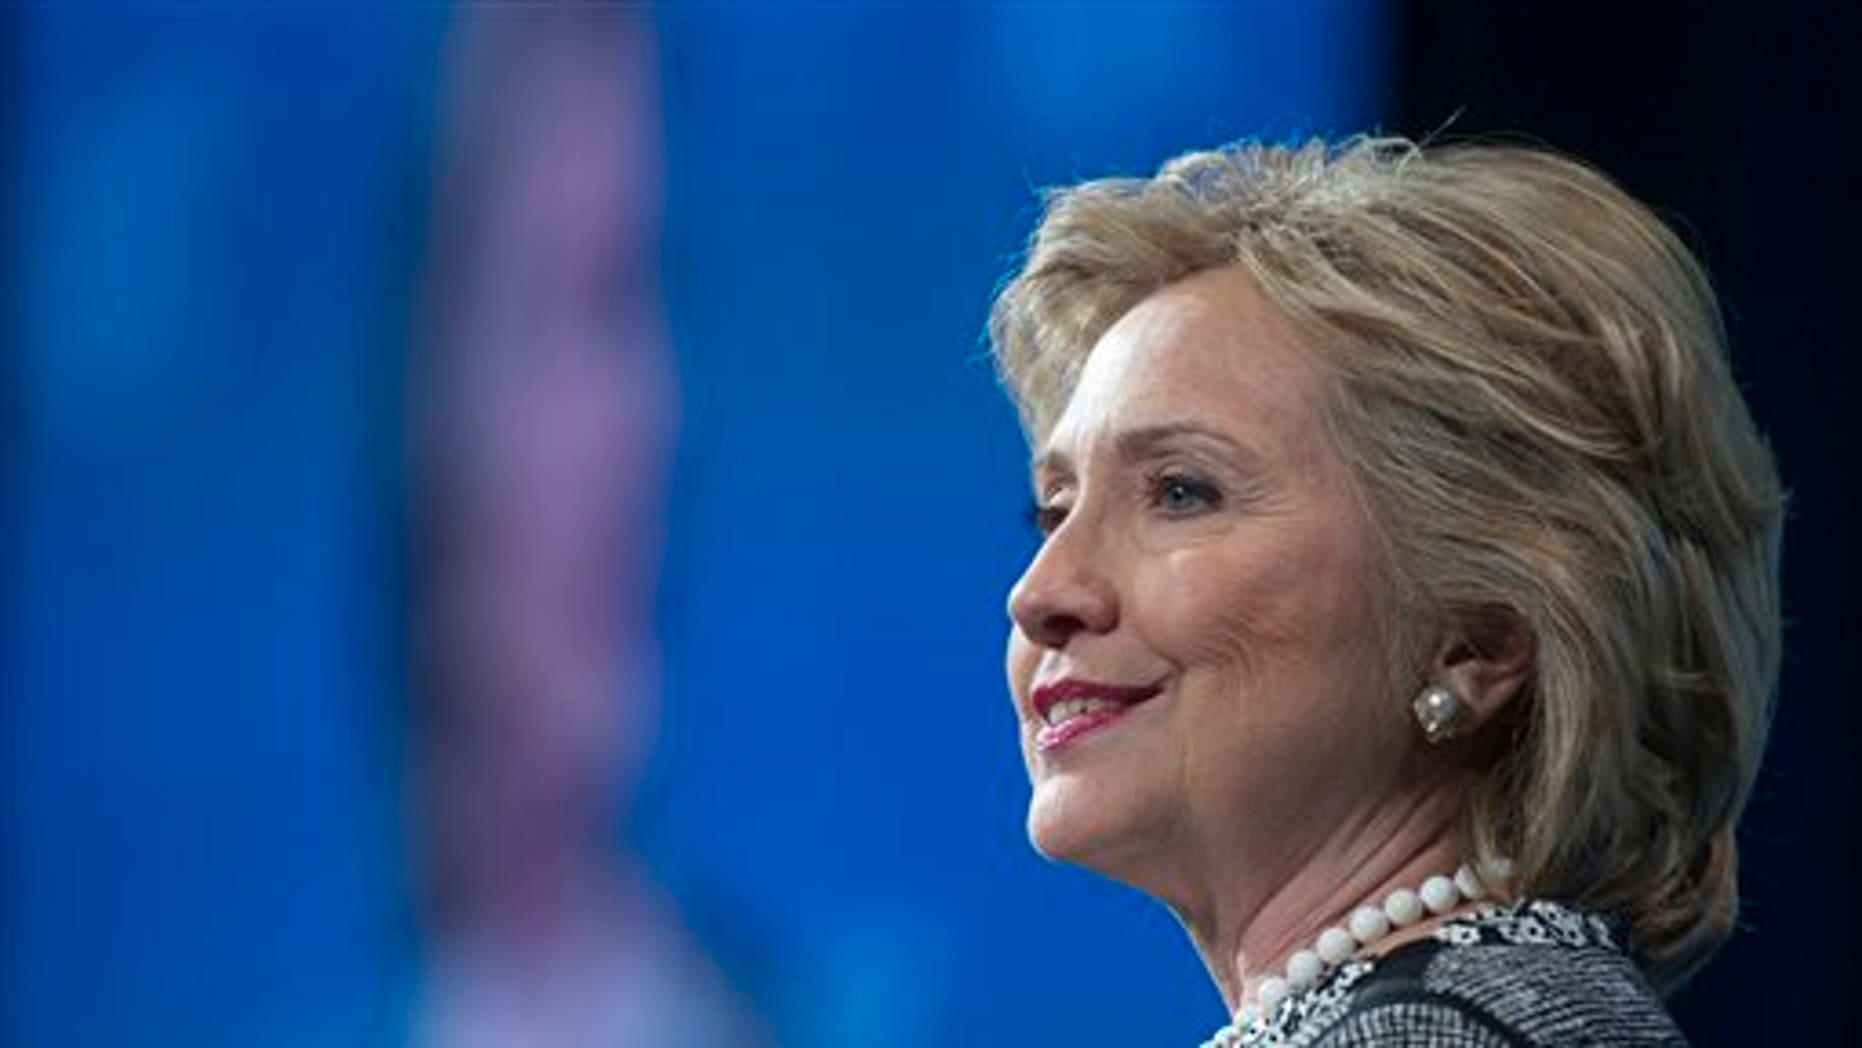 Former Secretary of State Hillary Rodham Clinton addresses the American Jewish Committee (AJC) Global Forum closing plenary in Washington, Wednesday, May 14, 2014. (AP Photo/Cliff Owen)